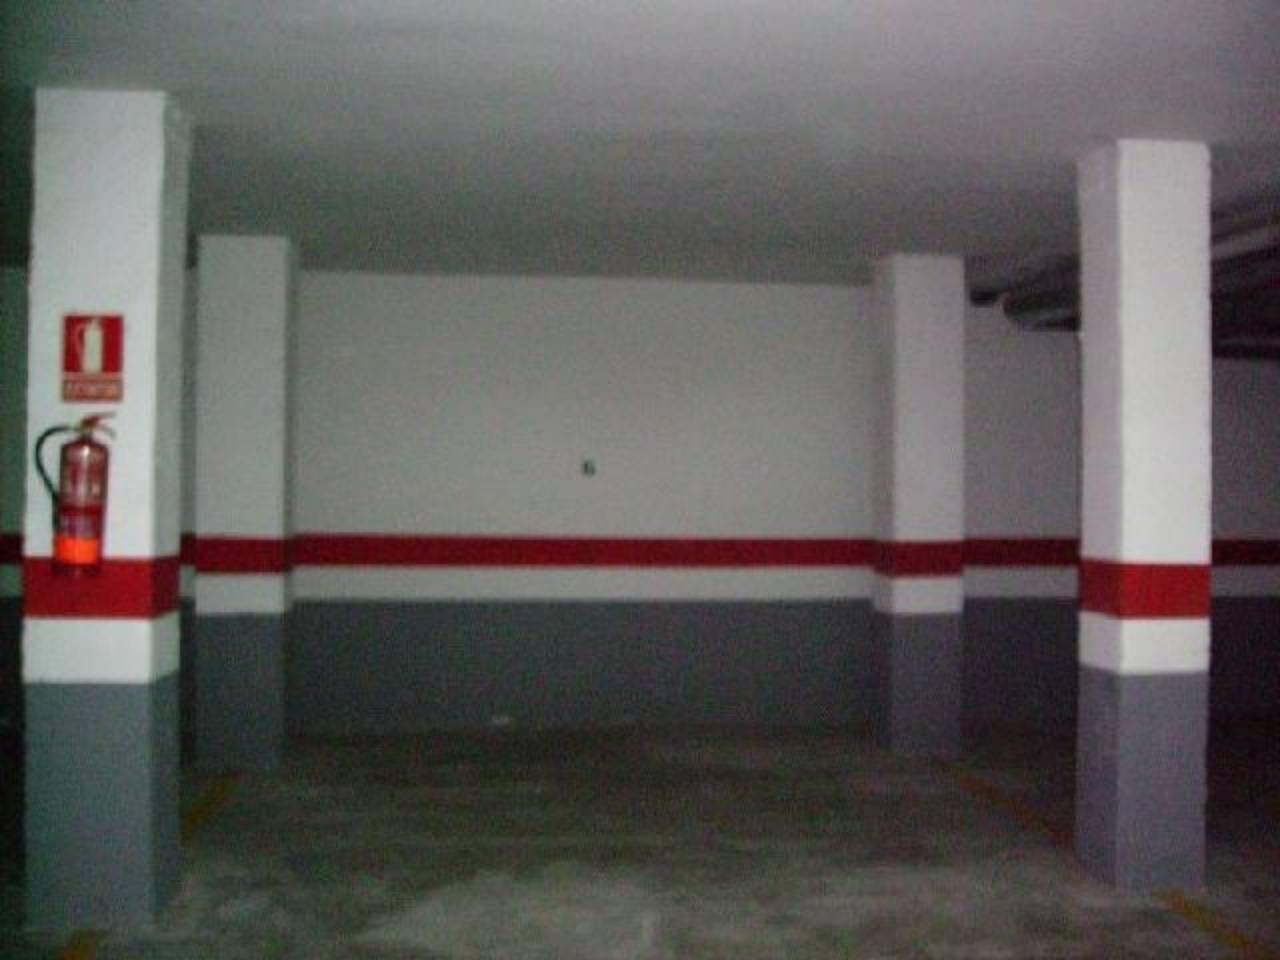 Aparcament cotxe  Garaje  de banco. Superf. 10 m², 1 plazas, ascensor, garajes  de banco sin comisio